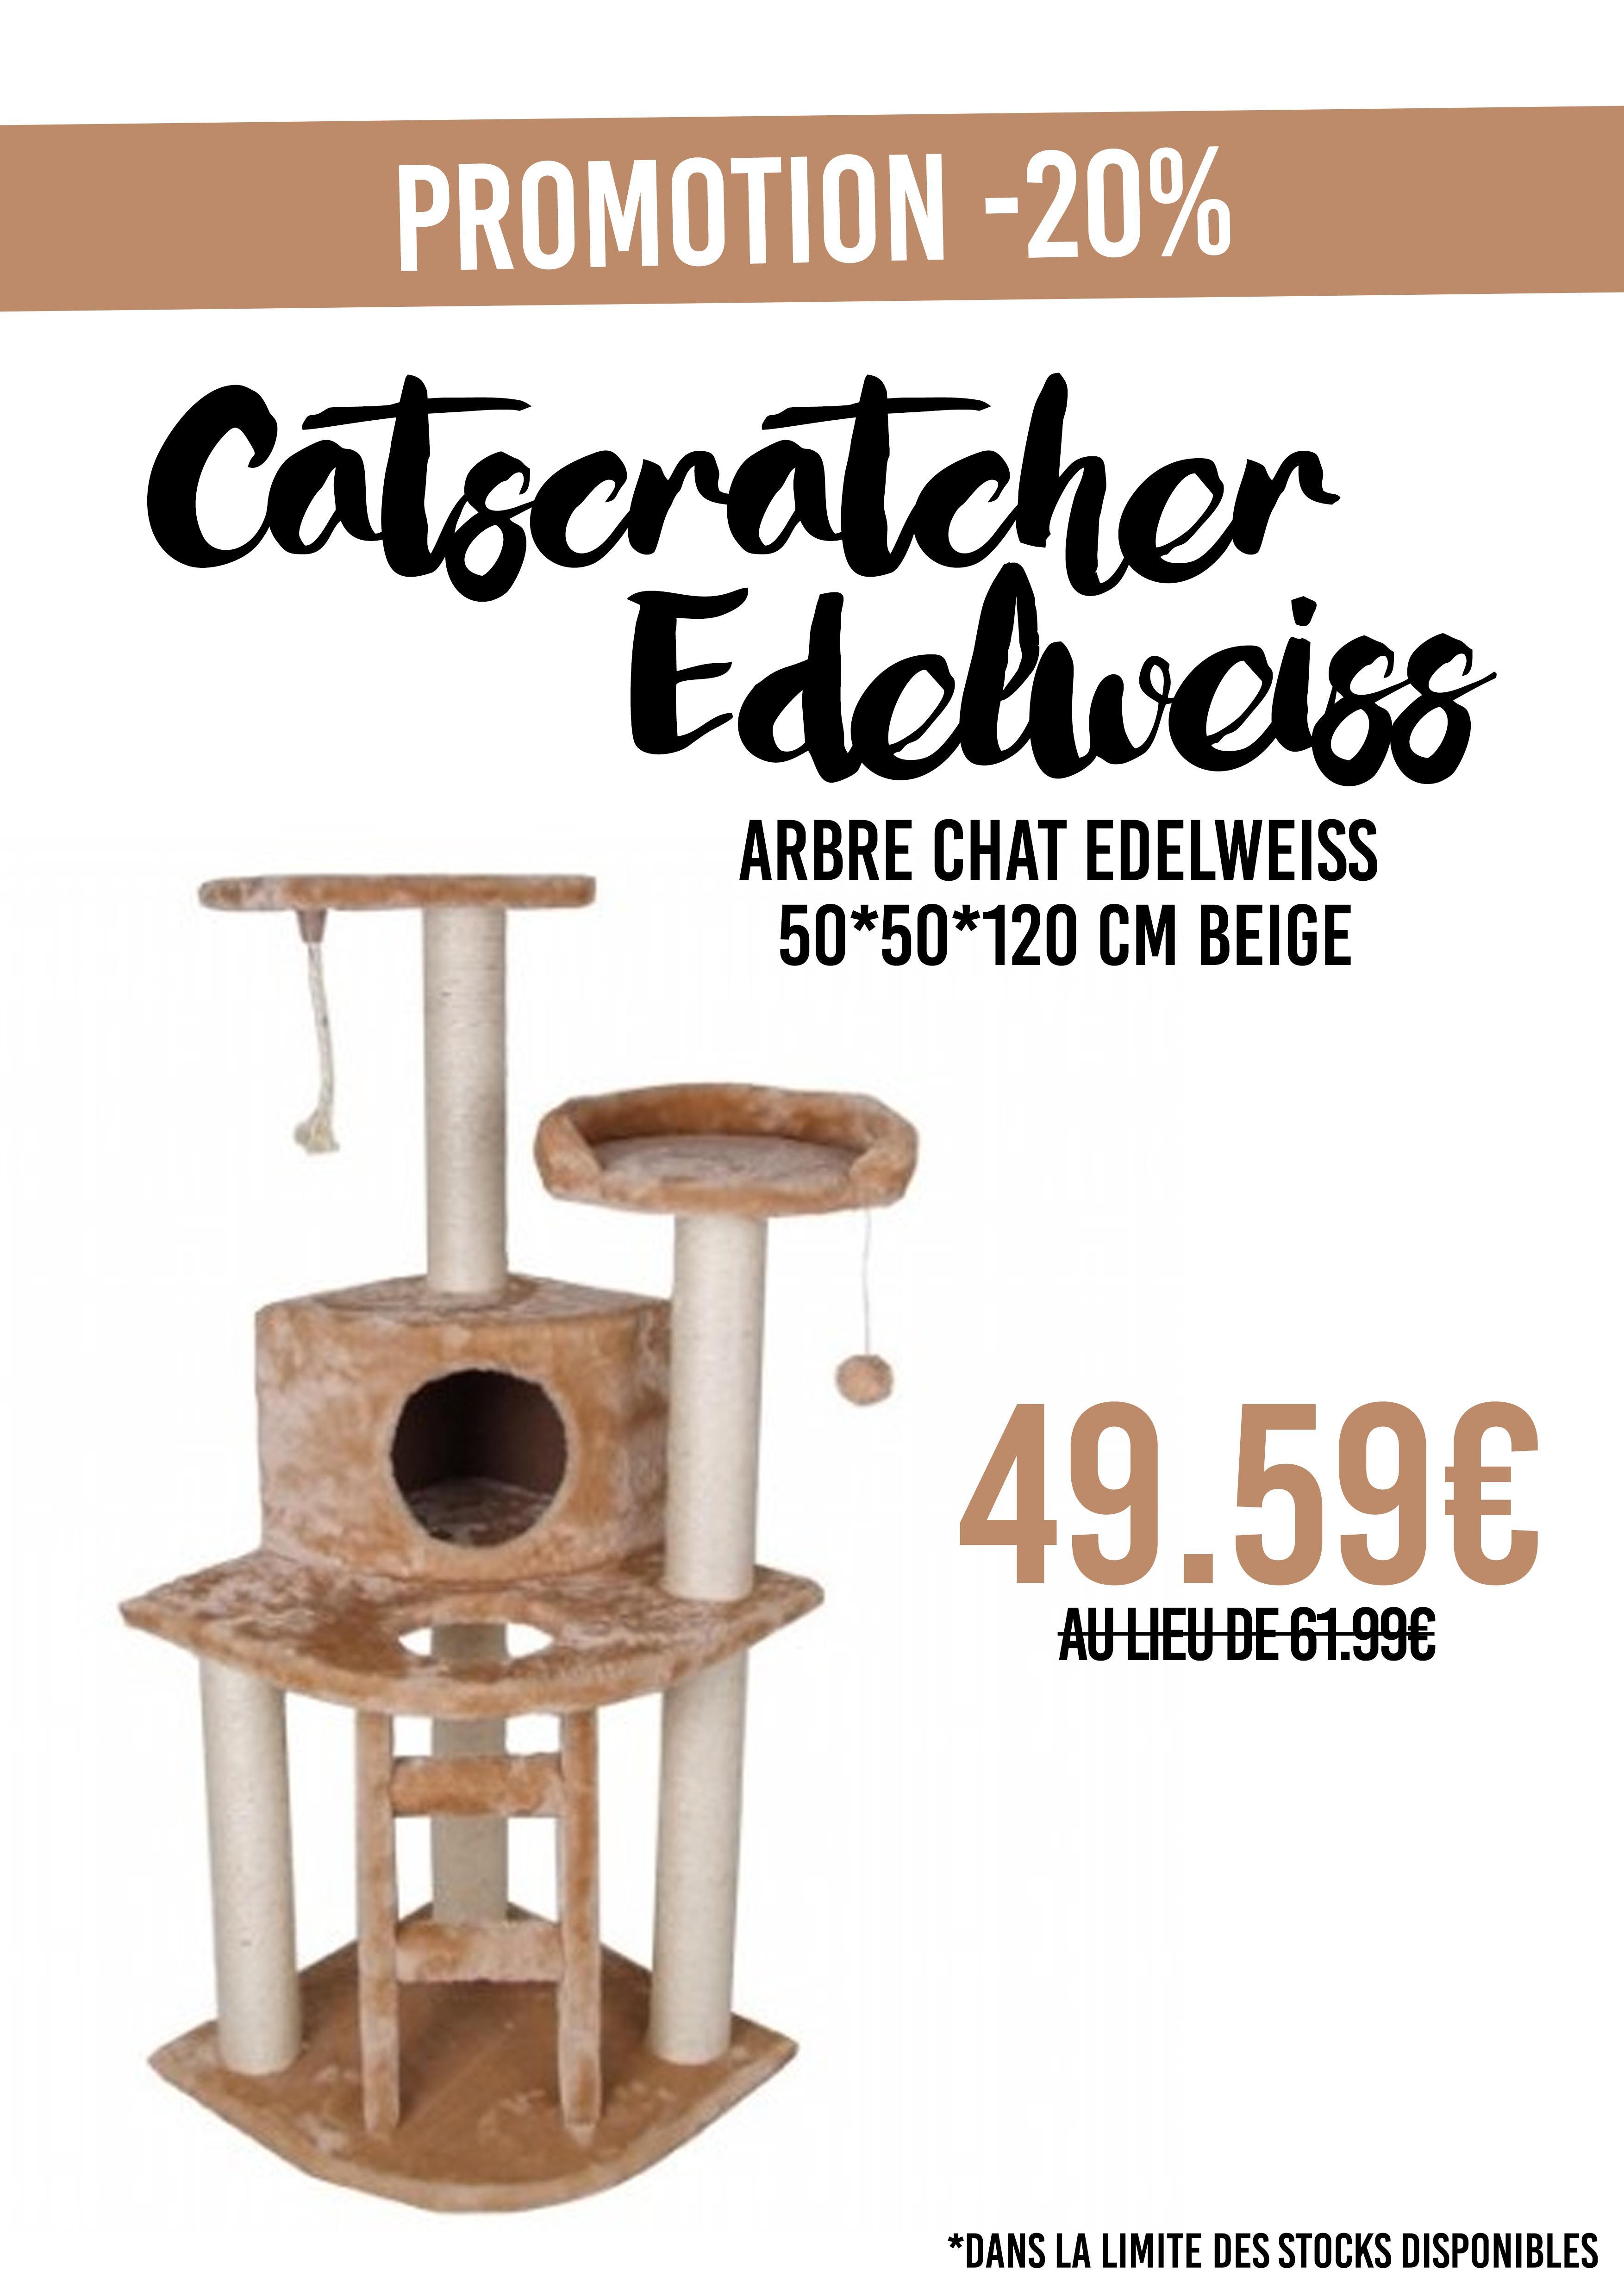 Arbre à chat Edelweiss (50 x 50 x 120 cm)